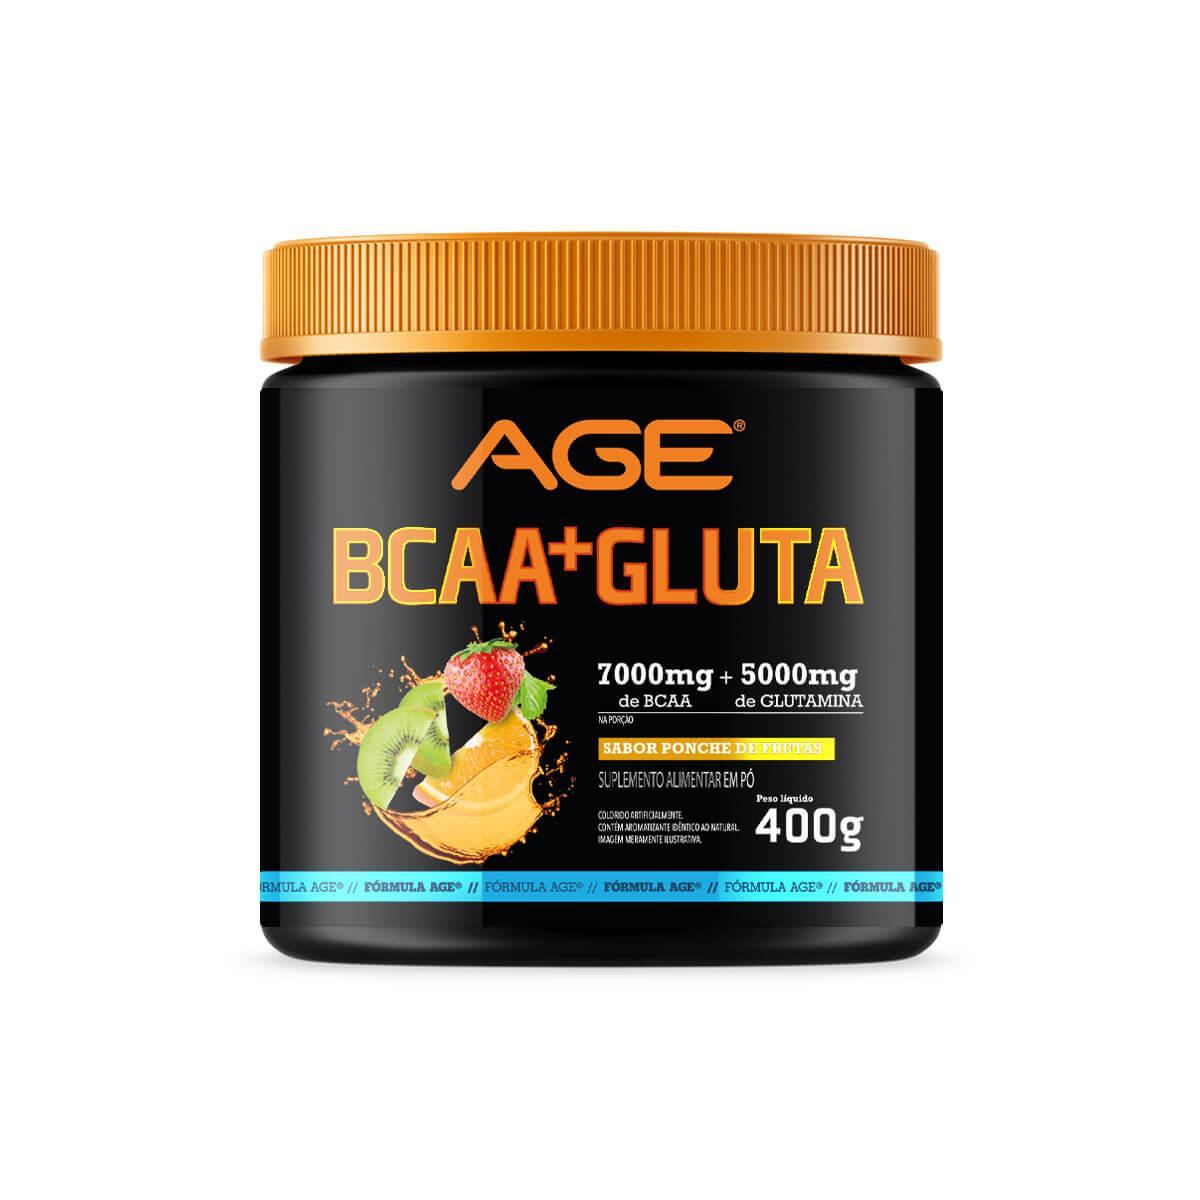 BCAA + GLUTAMINA (400g) - Ponche de Frutas - AGE